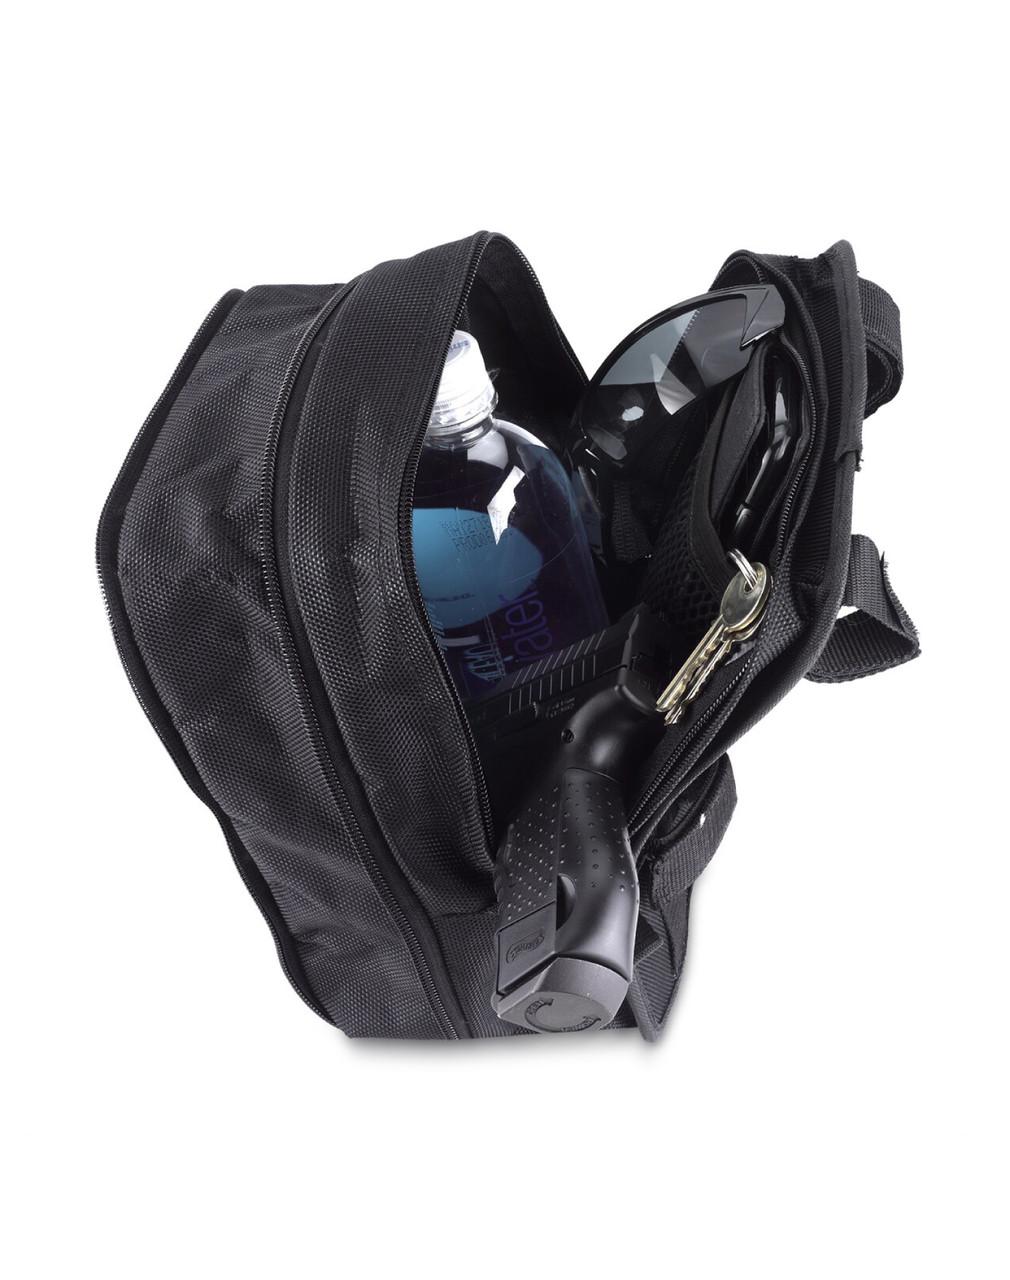 Indian Viking Tall T-Bar Bag Carrying Items View